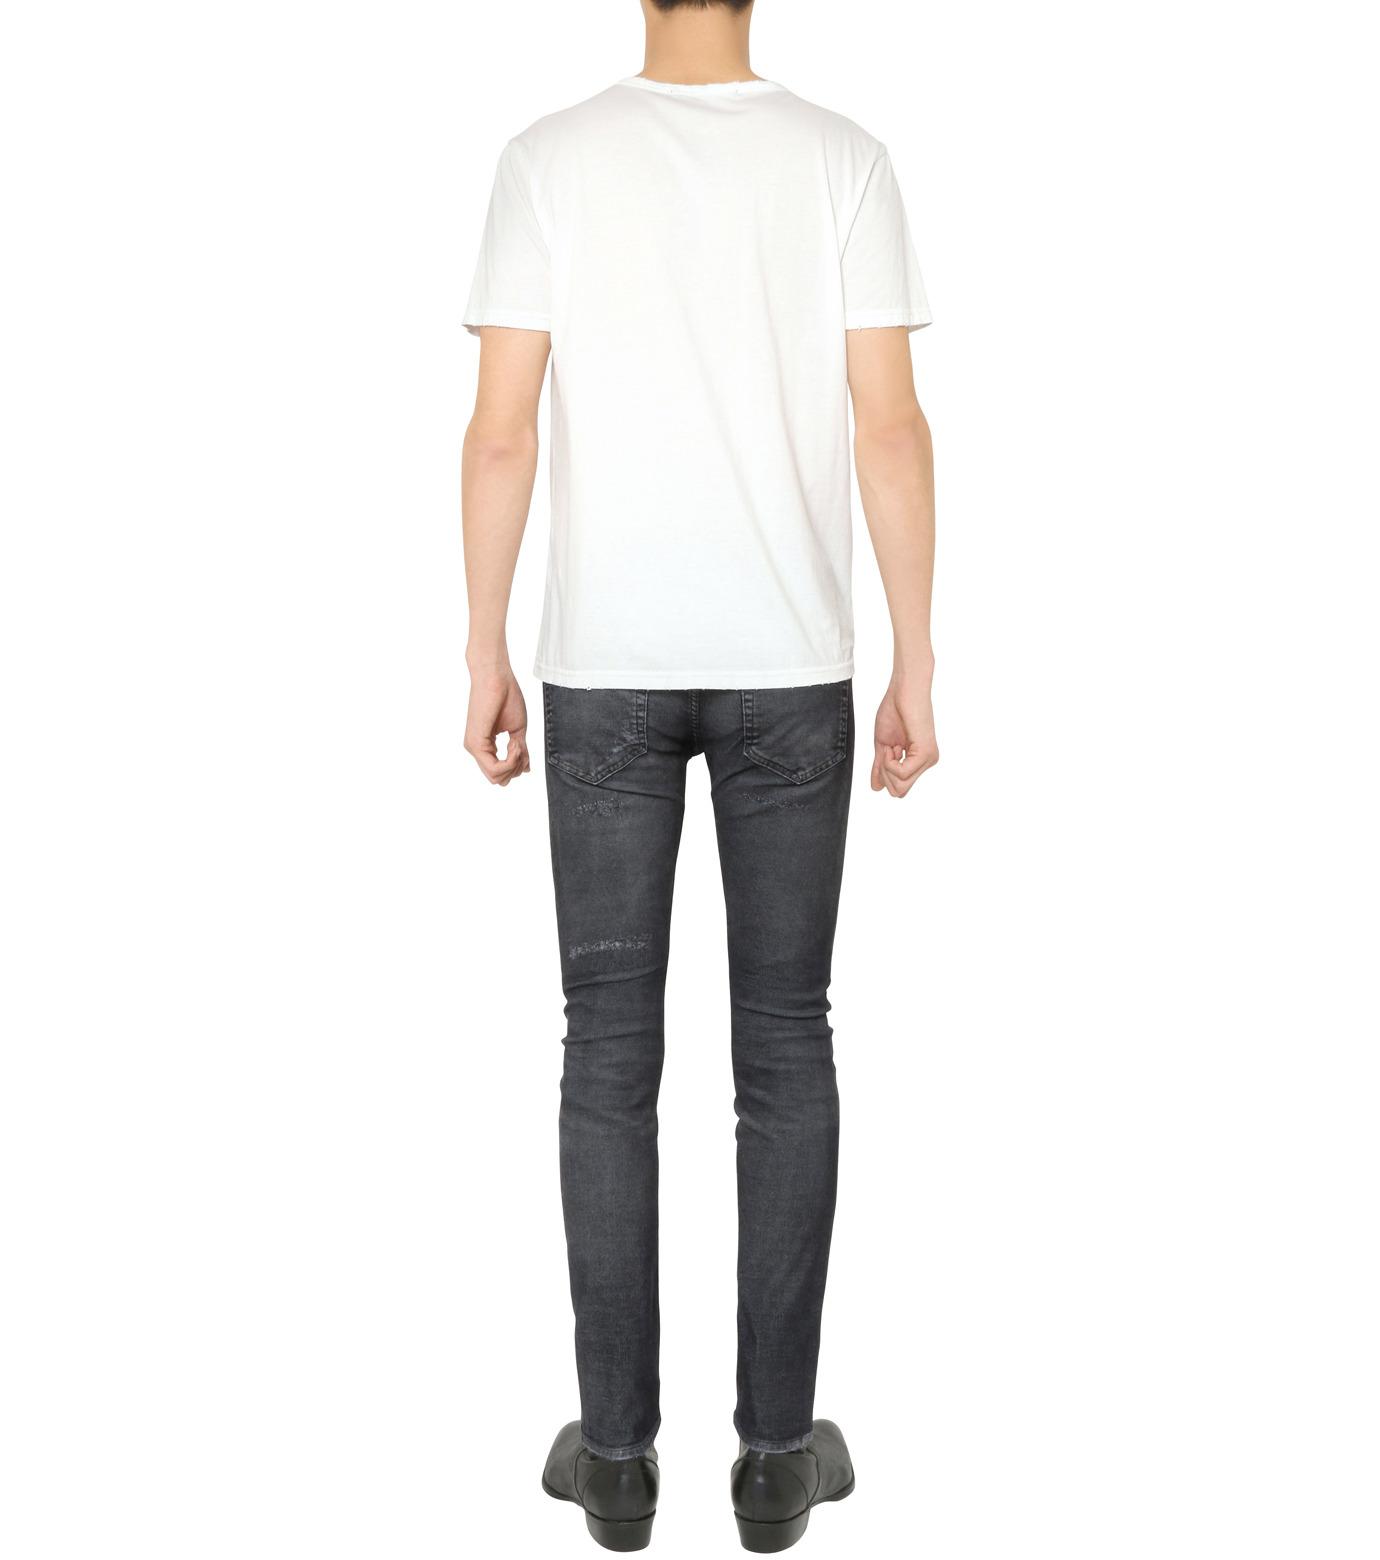 HL HEDDIE LOVU(エイチエル・エディールーヴ)のCOATING CORDUROY PANTS-GRAY(パンツ/pants)-18A98002-11 拡大詳細画像3